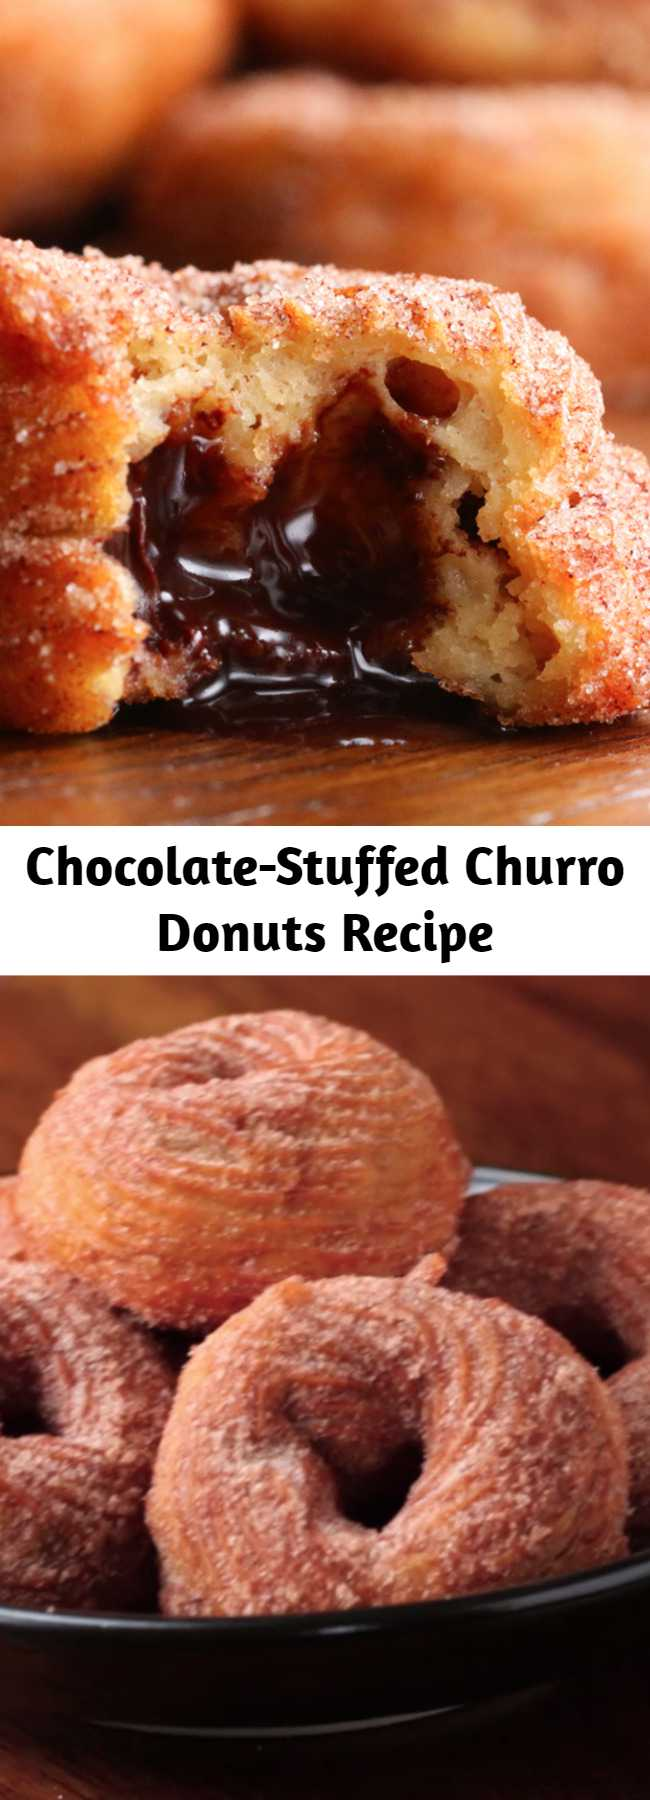 Chocolate-Stuffed Churro Donuts Recipe - This is a super cool recipe. Super fun and delicious 😋